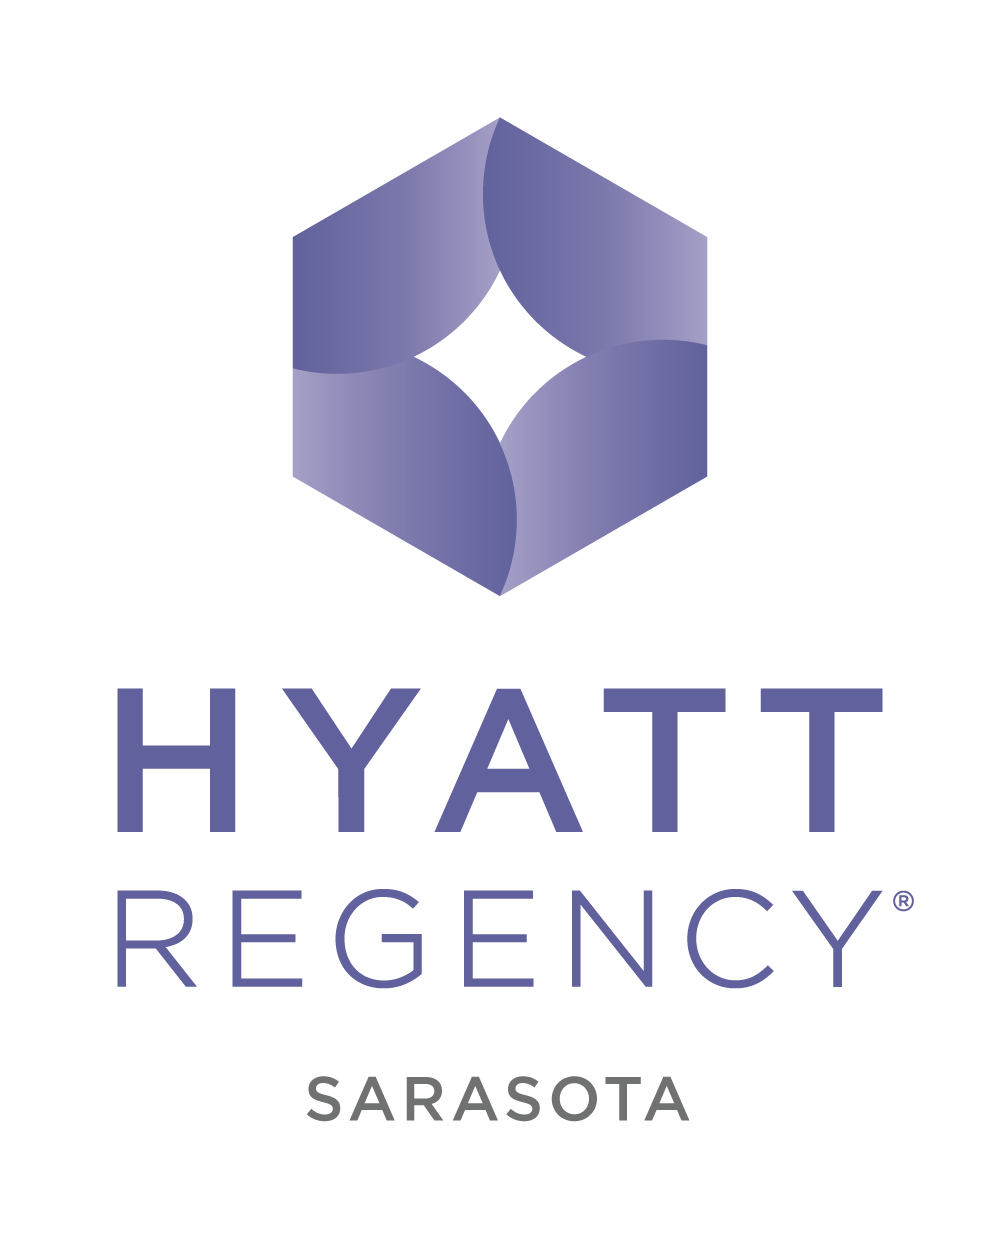 Hyatt Regency Sarasota logo